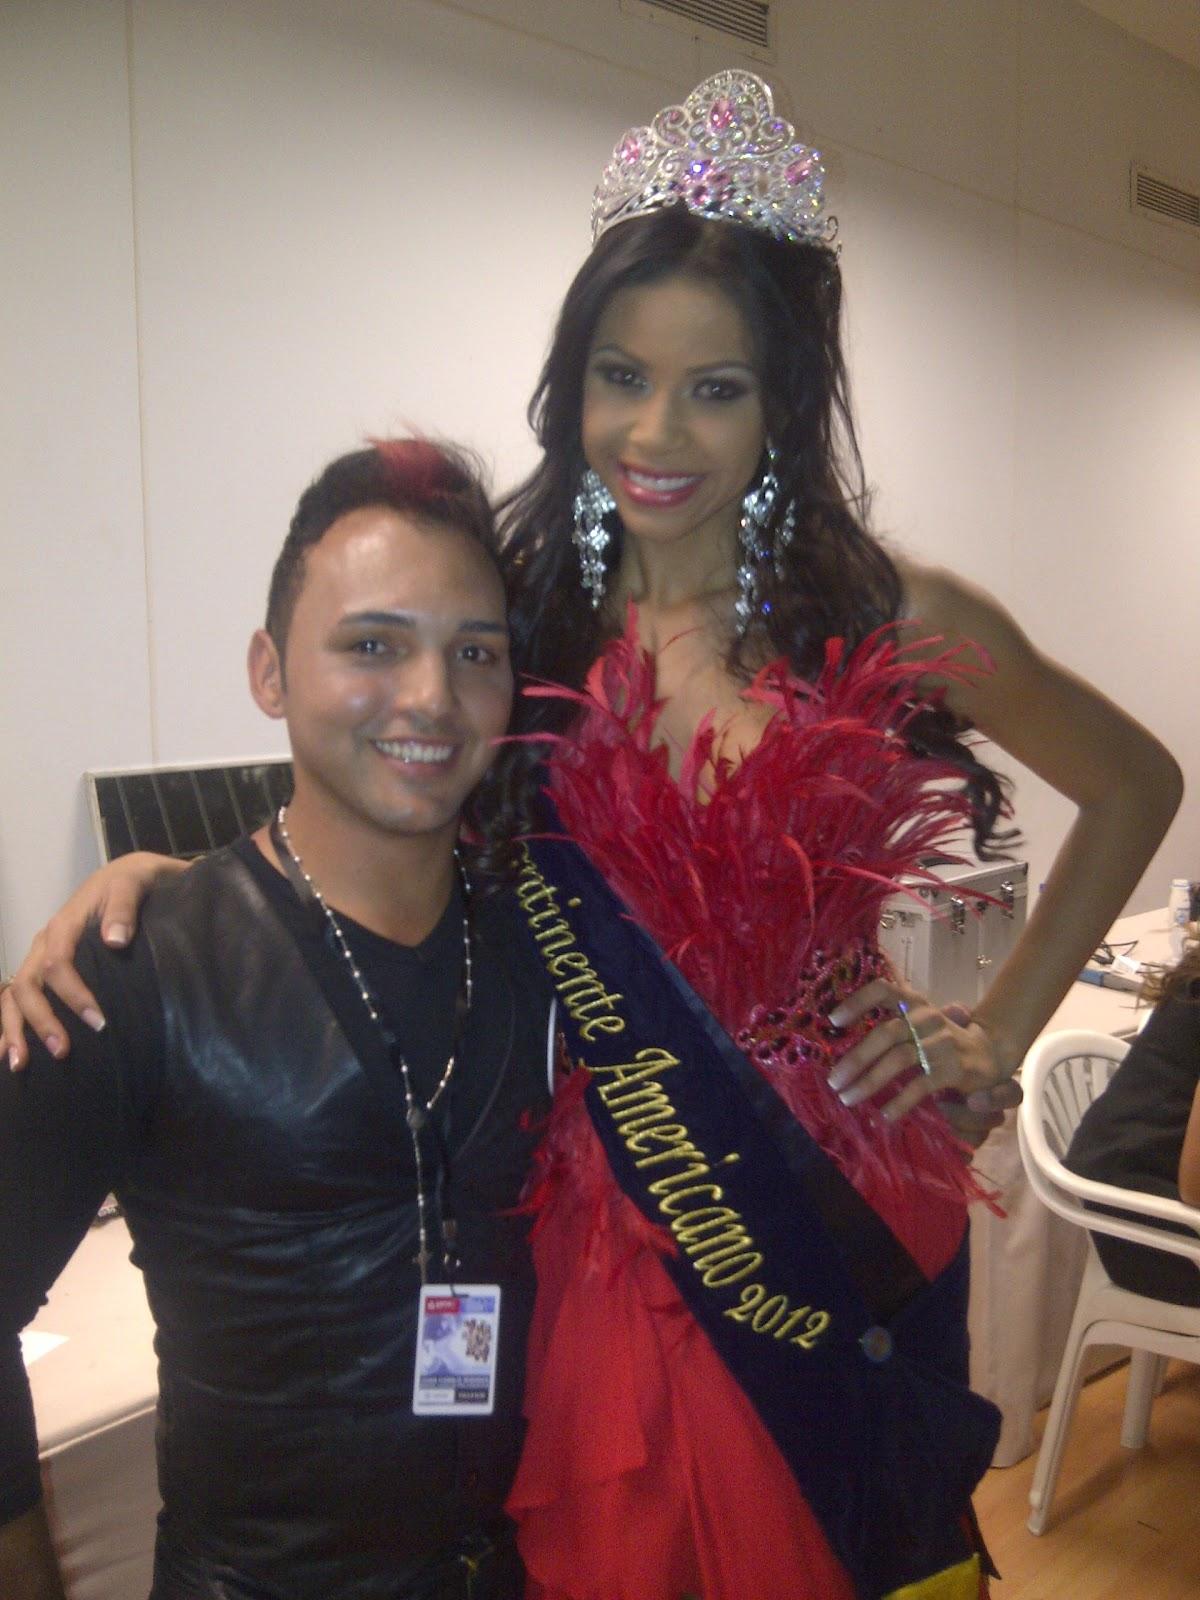 camila serakides, miss continentee americano 2012. - Página 2 5k2e62j5